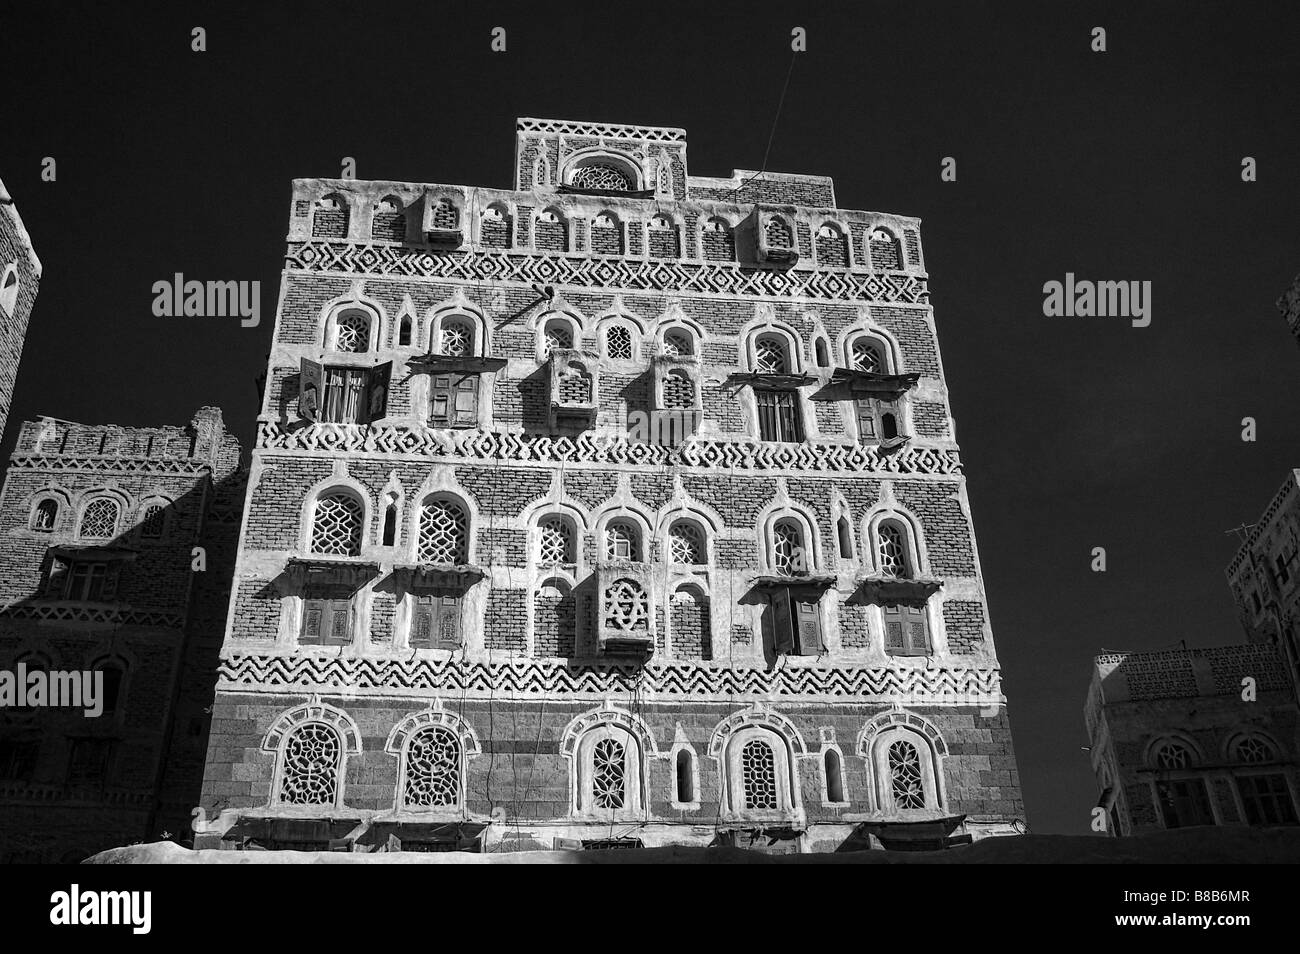 Infra red of Sanaa old town, Yemen - Stock Image